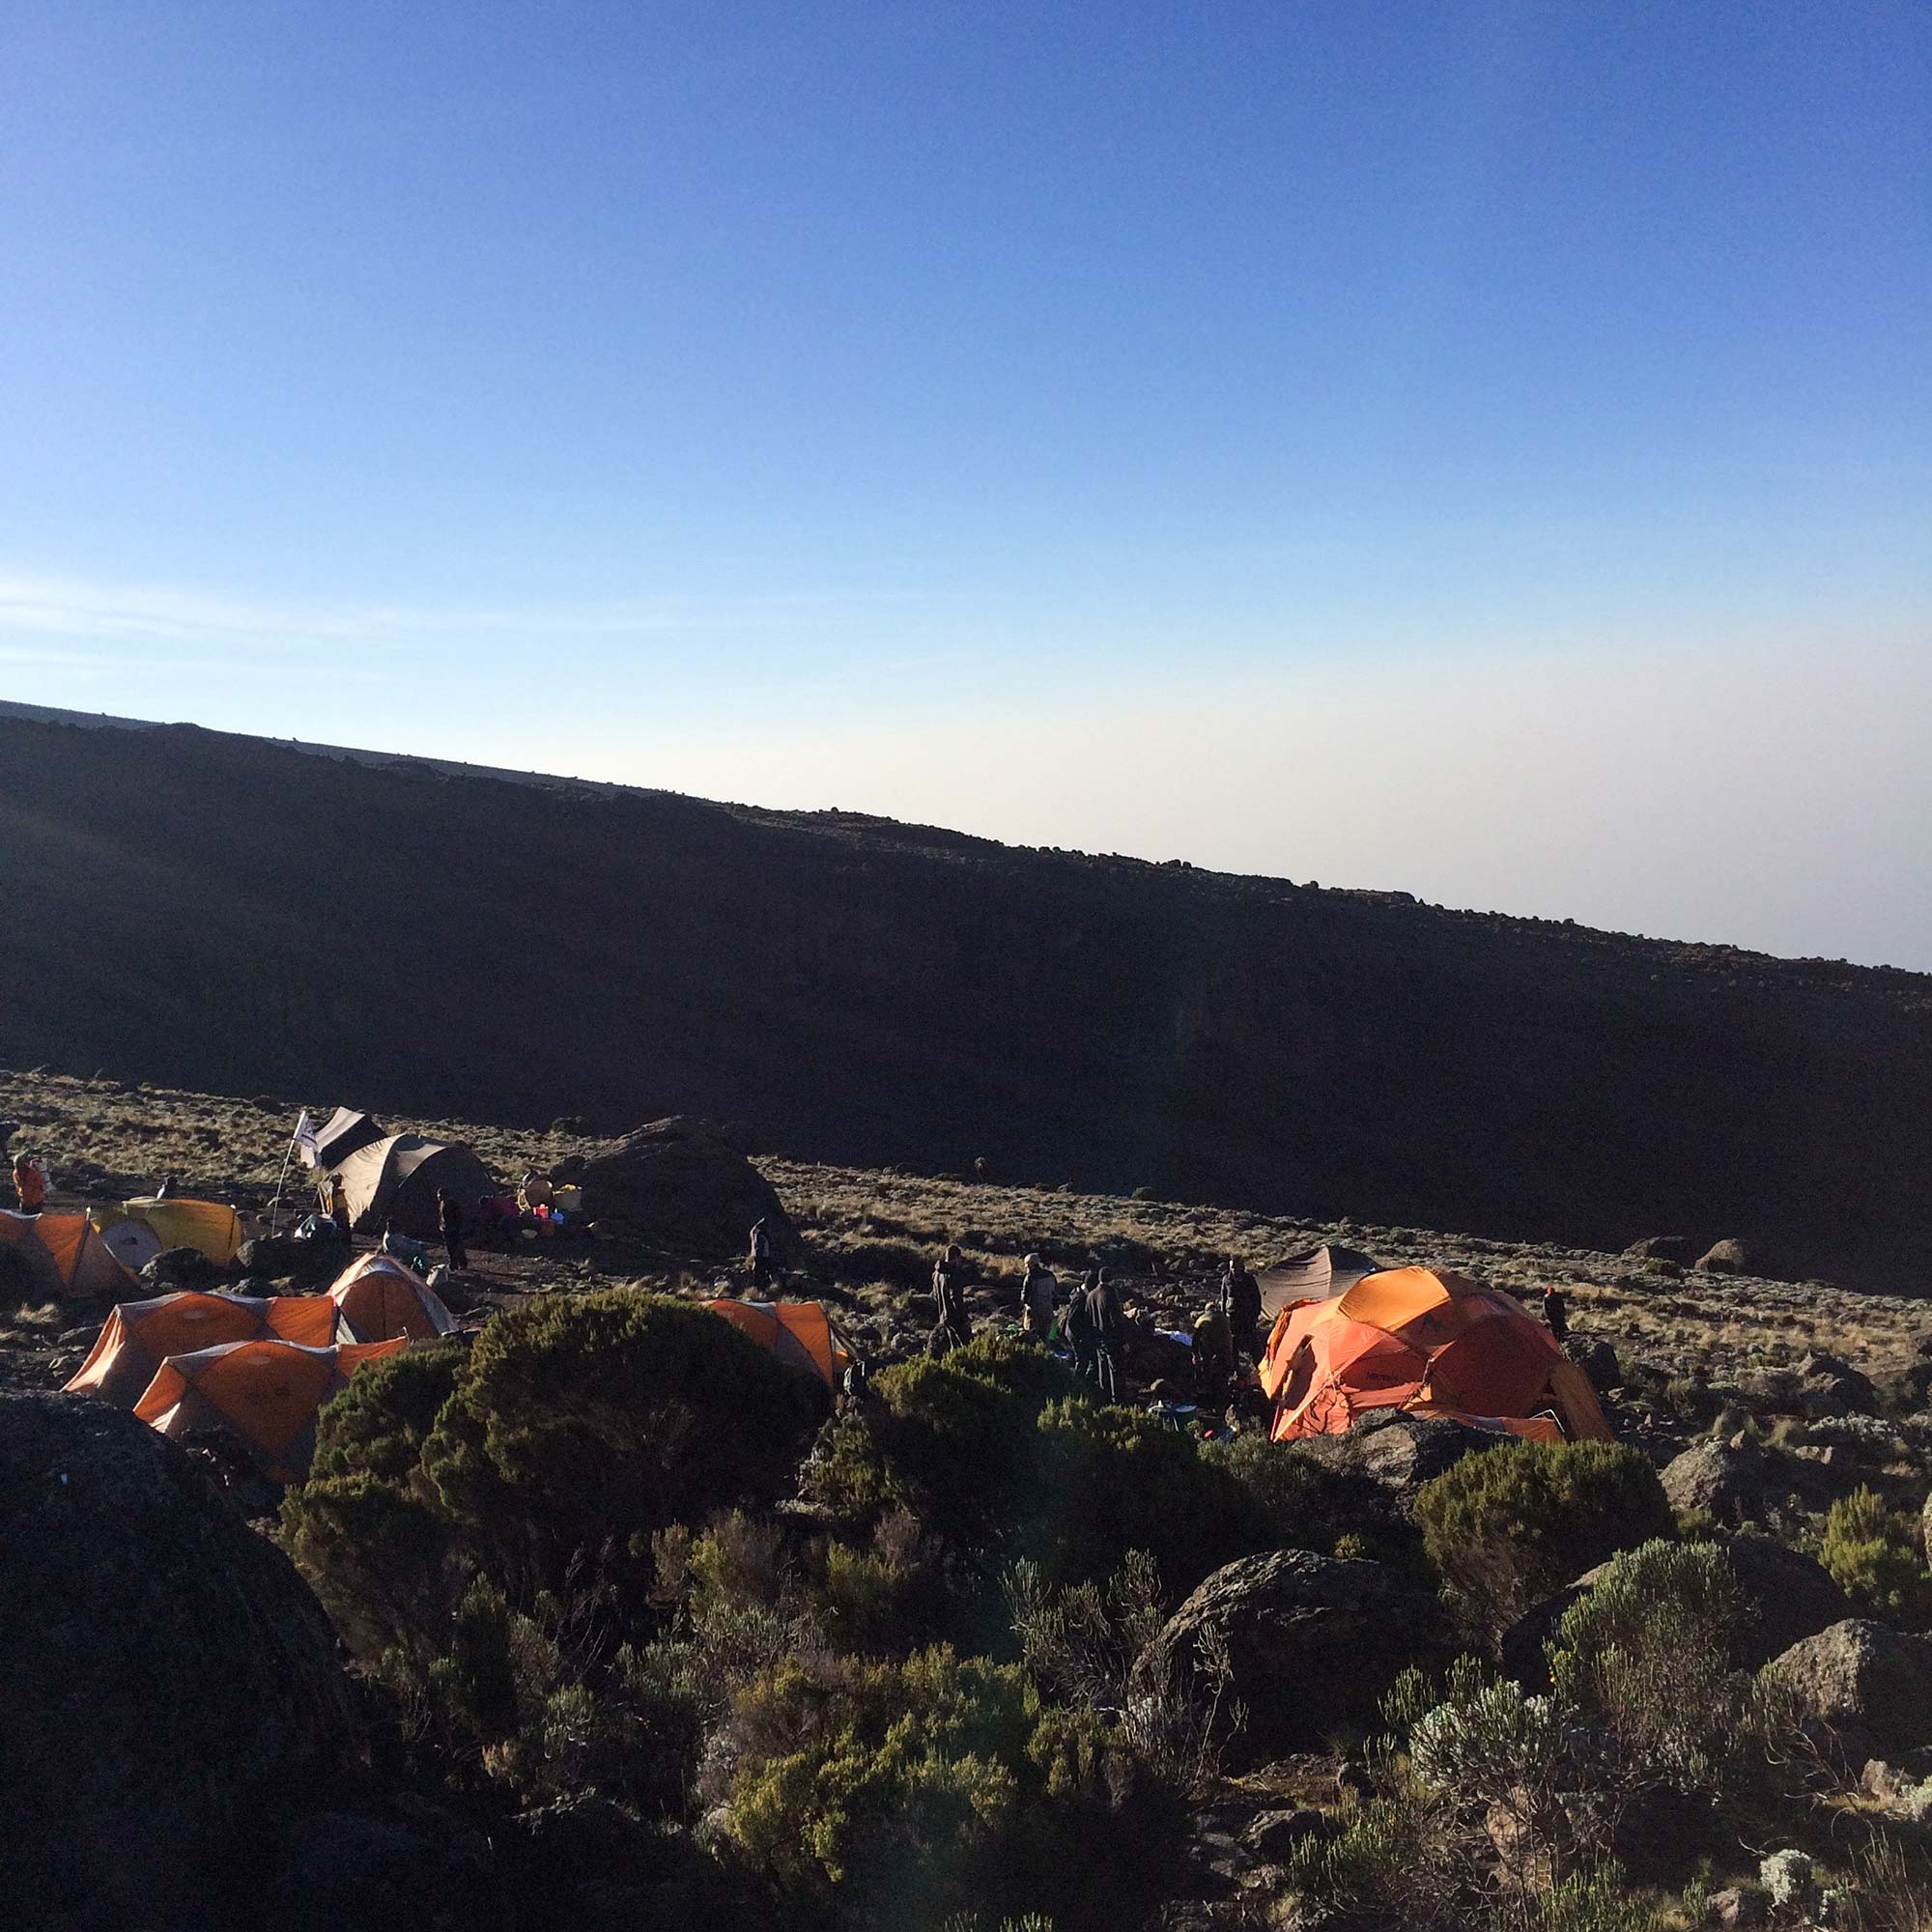 D6-19-living-on-an-incline-karanga-camp-kilimanjaro.jpg